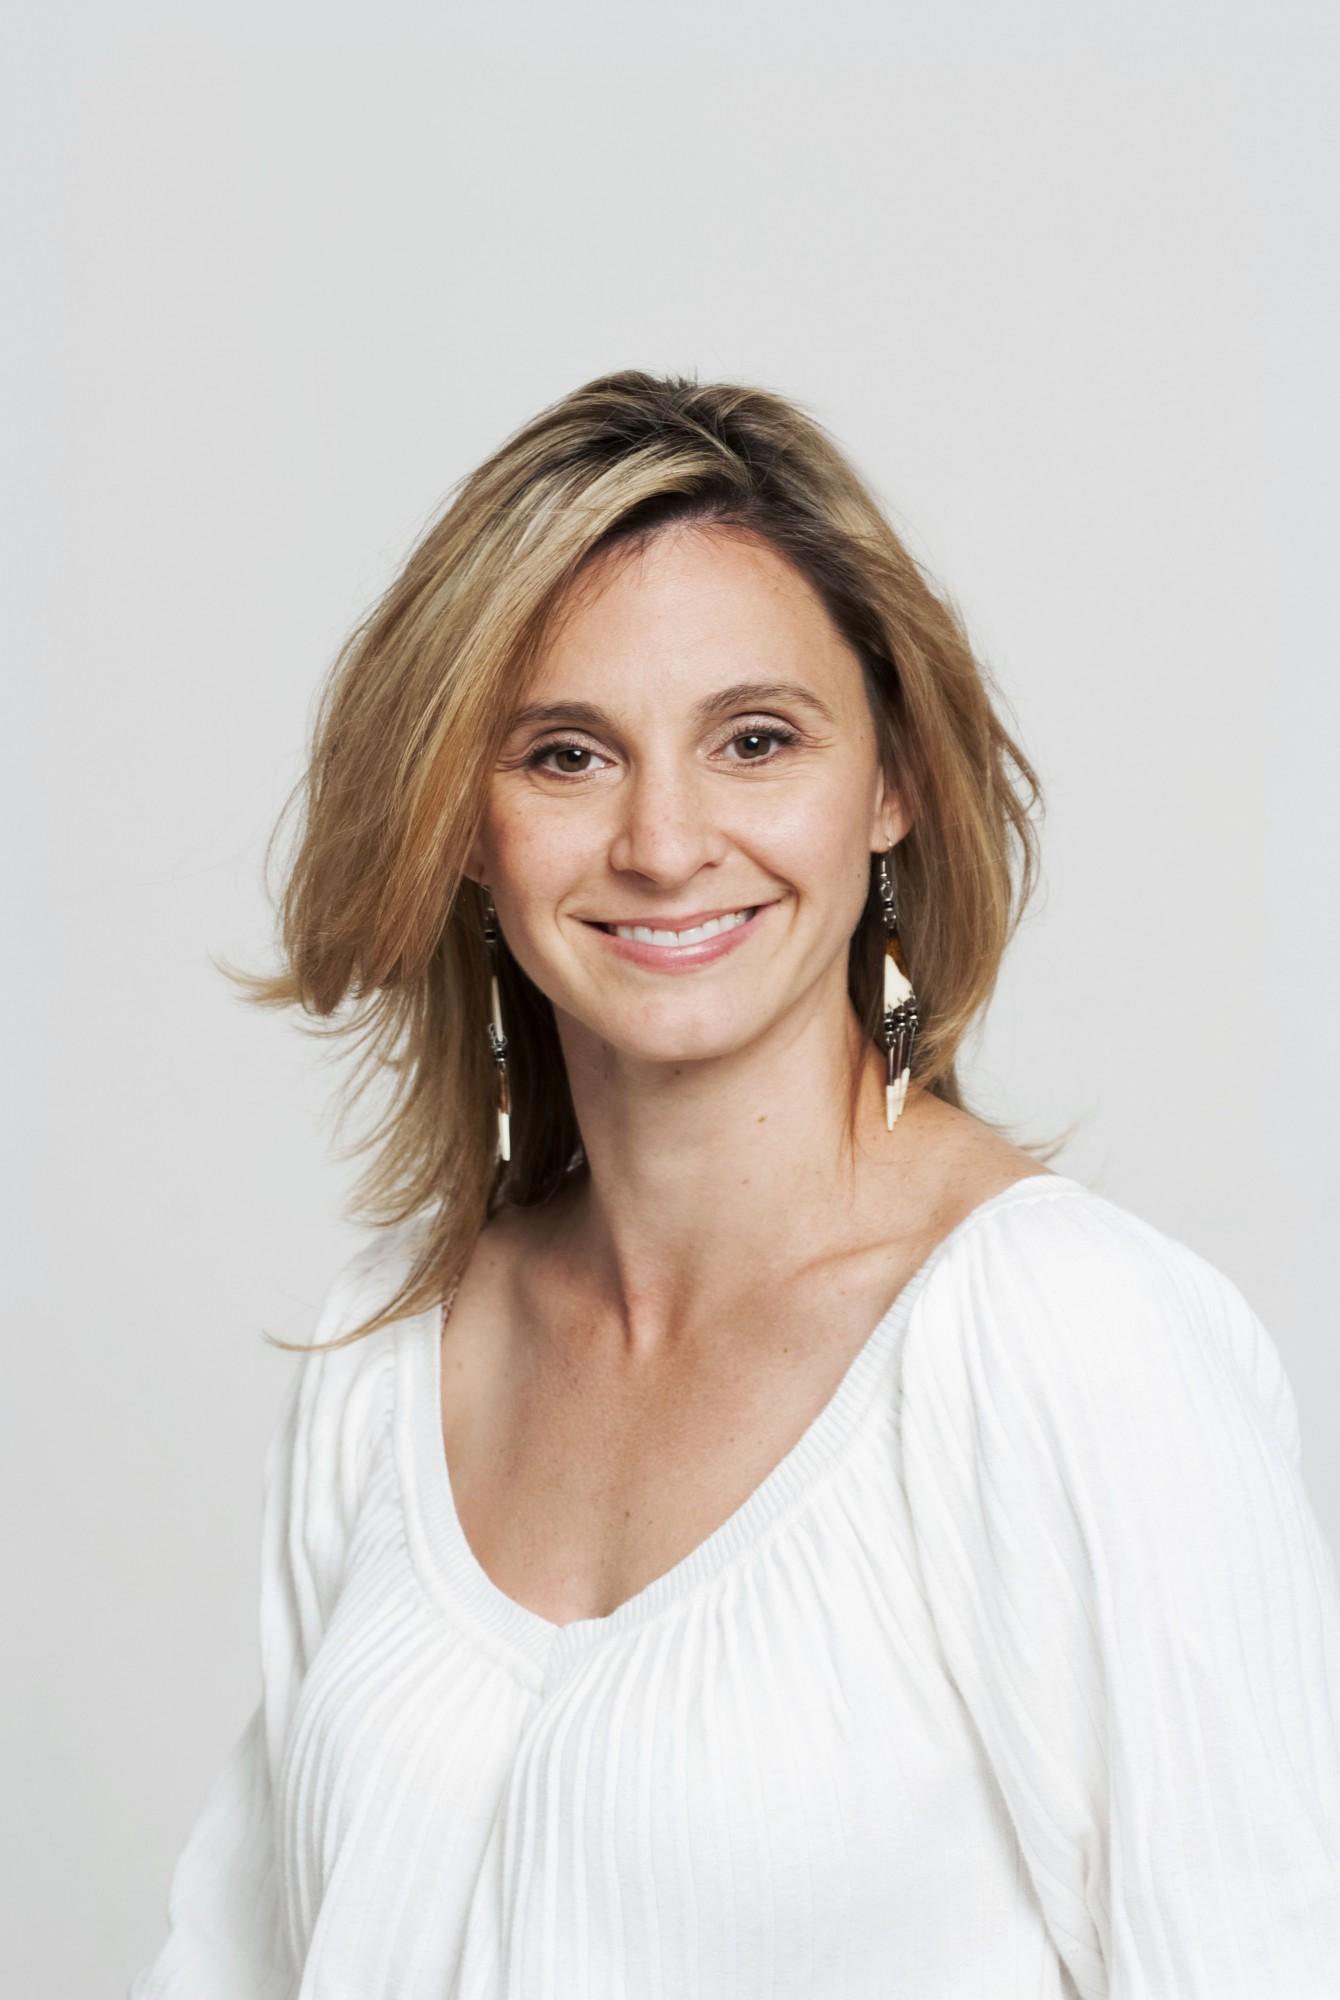 Roxanne Brouillet